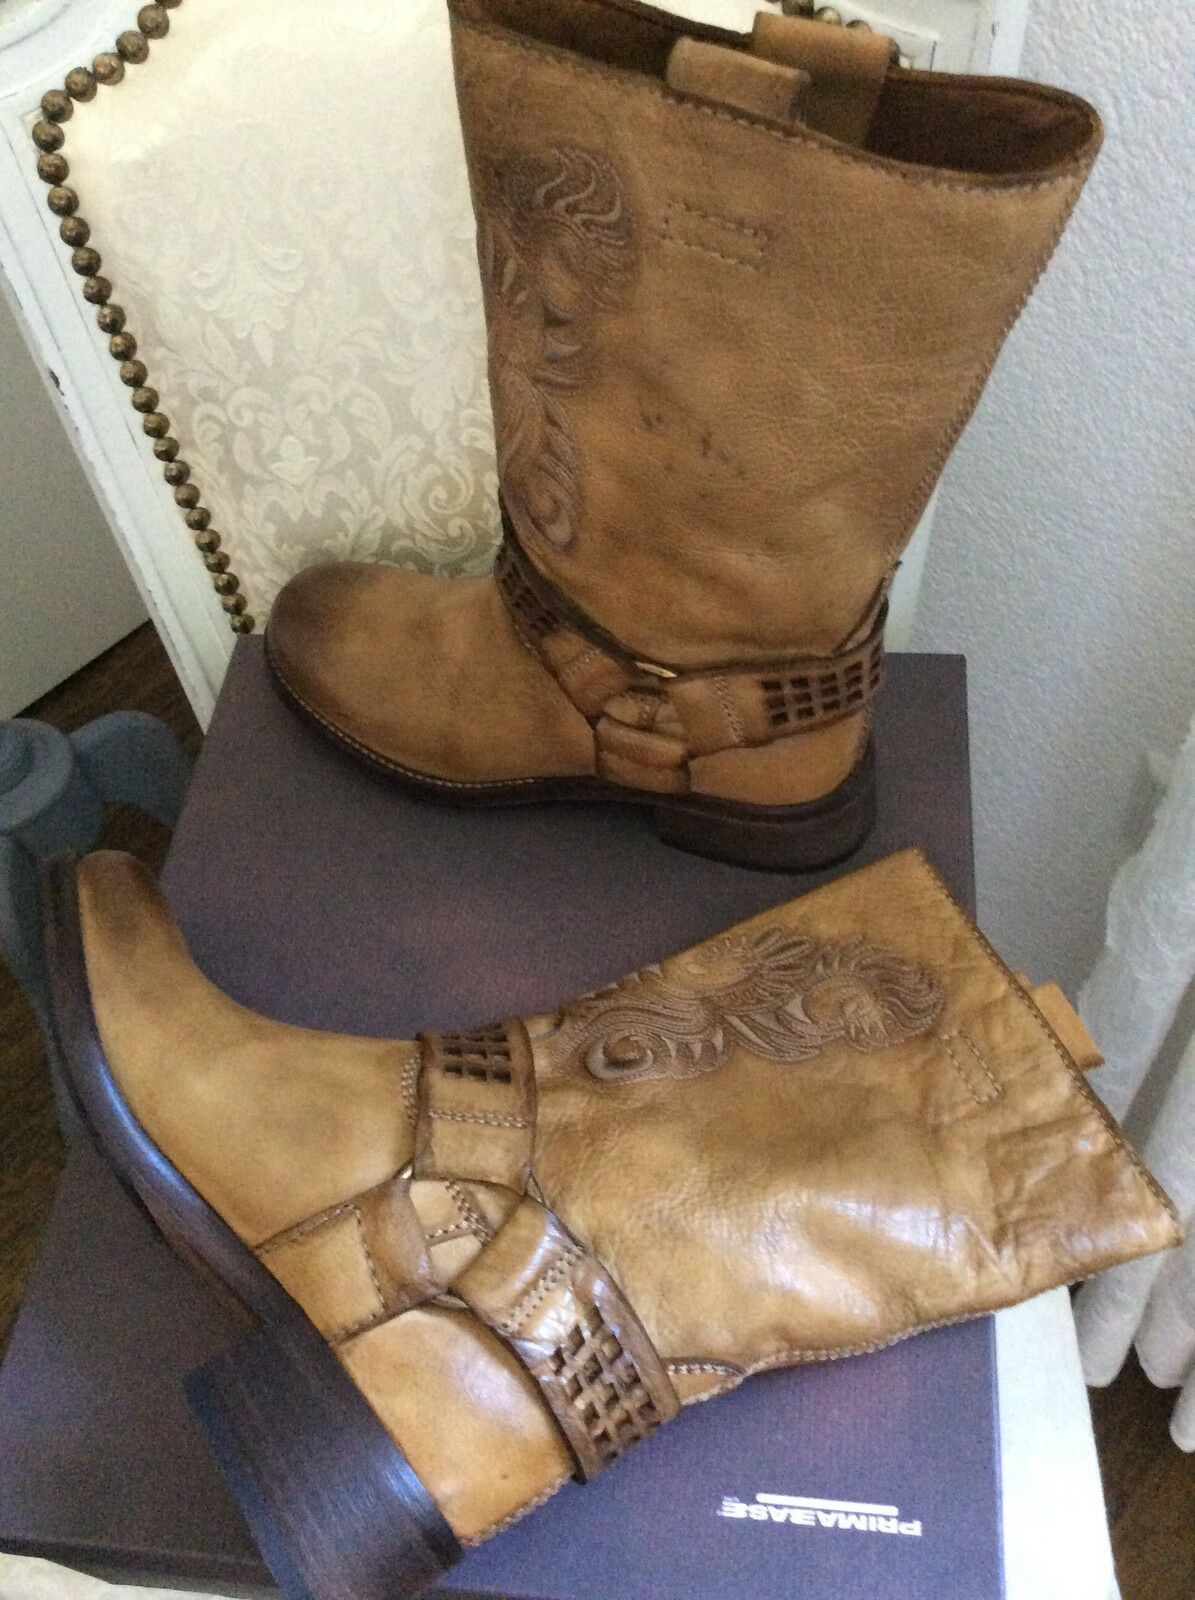 Neu Primabase Vintage Stiefel Stiefel Impressionen Stickerei Vintage Primabase 317e3e